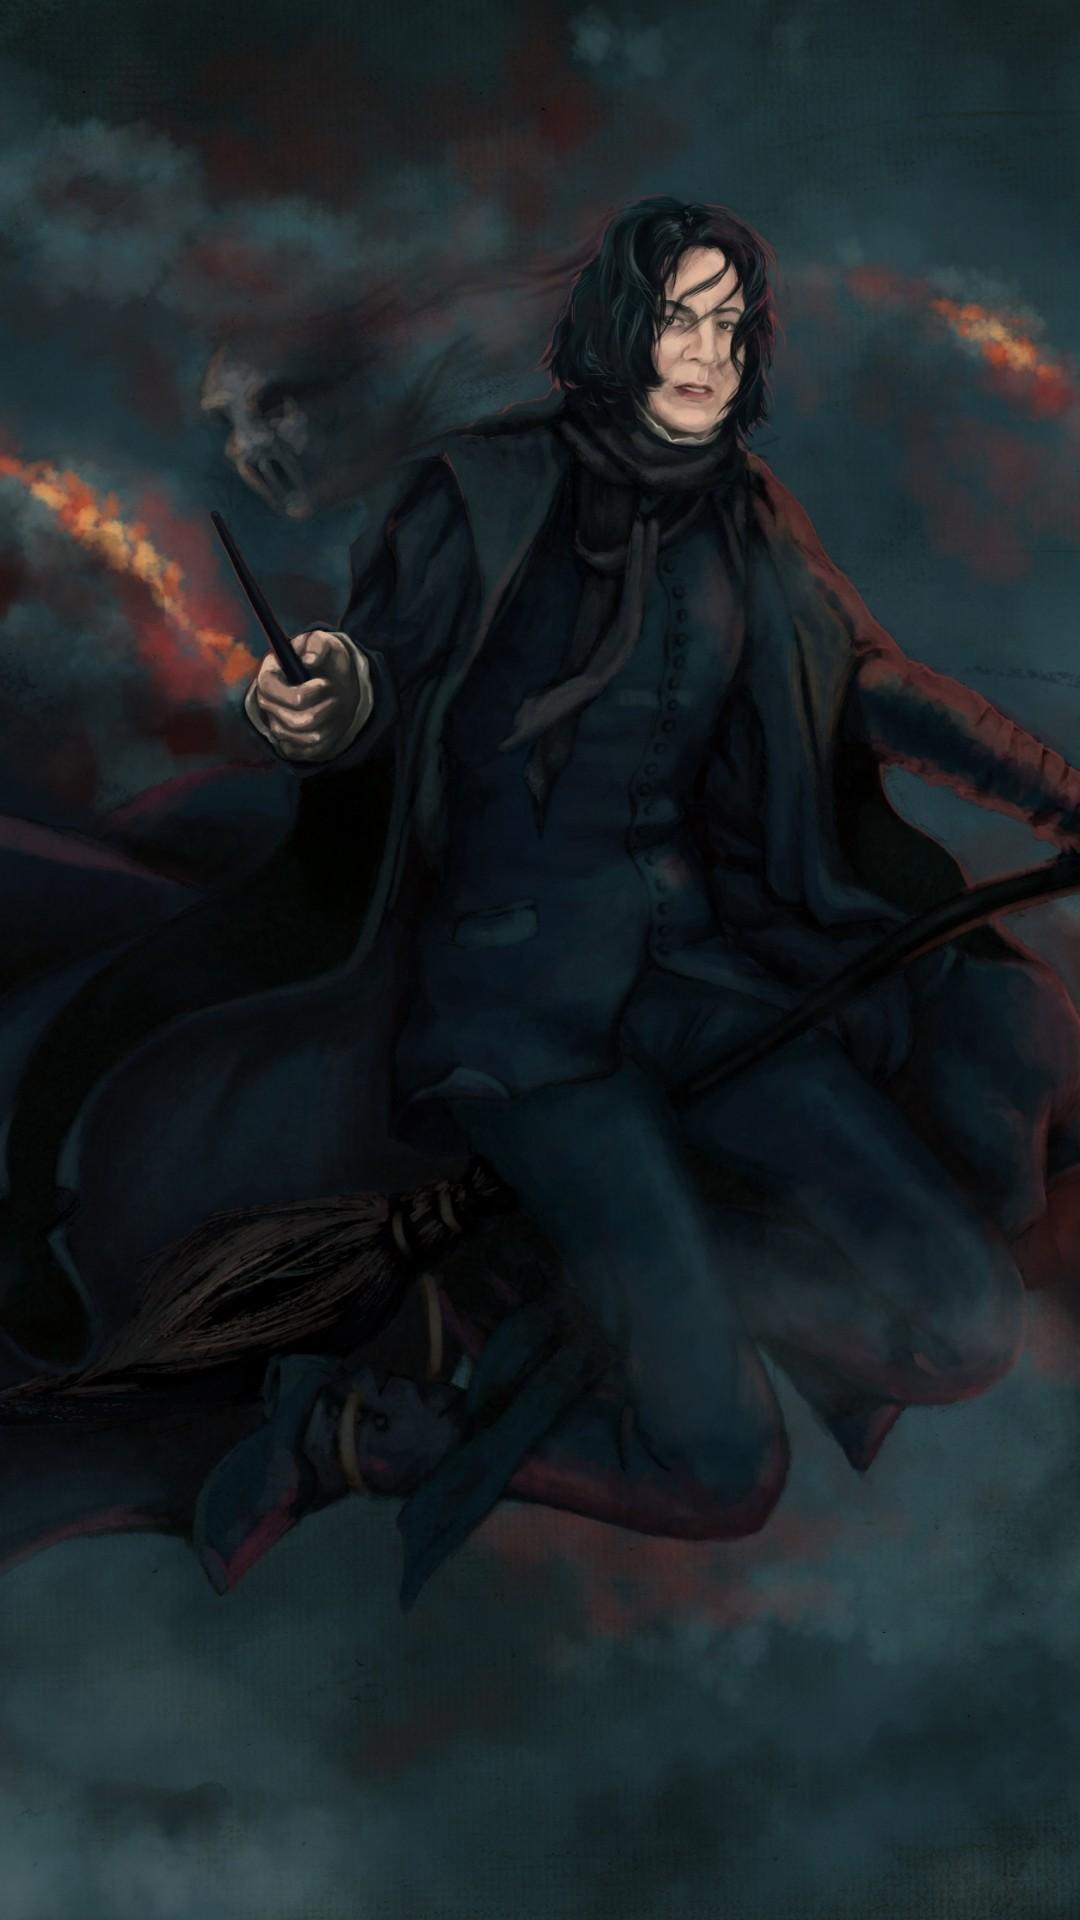 Alan Rickman Harry Potter - Harry Potter Wallpaper Hd - HD Wallpaper